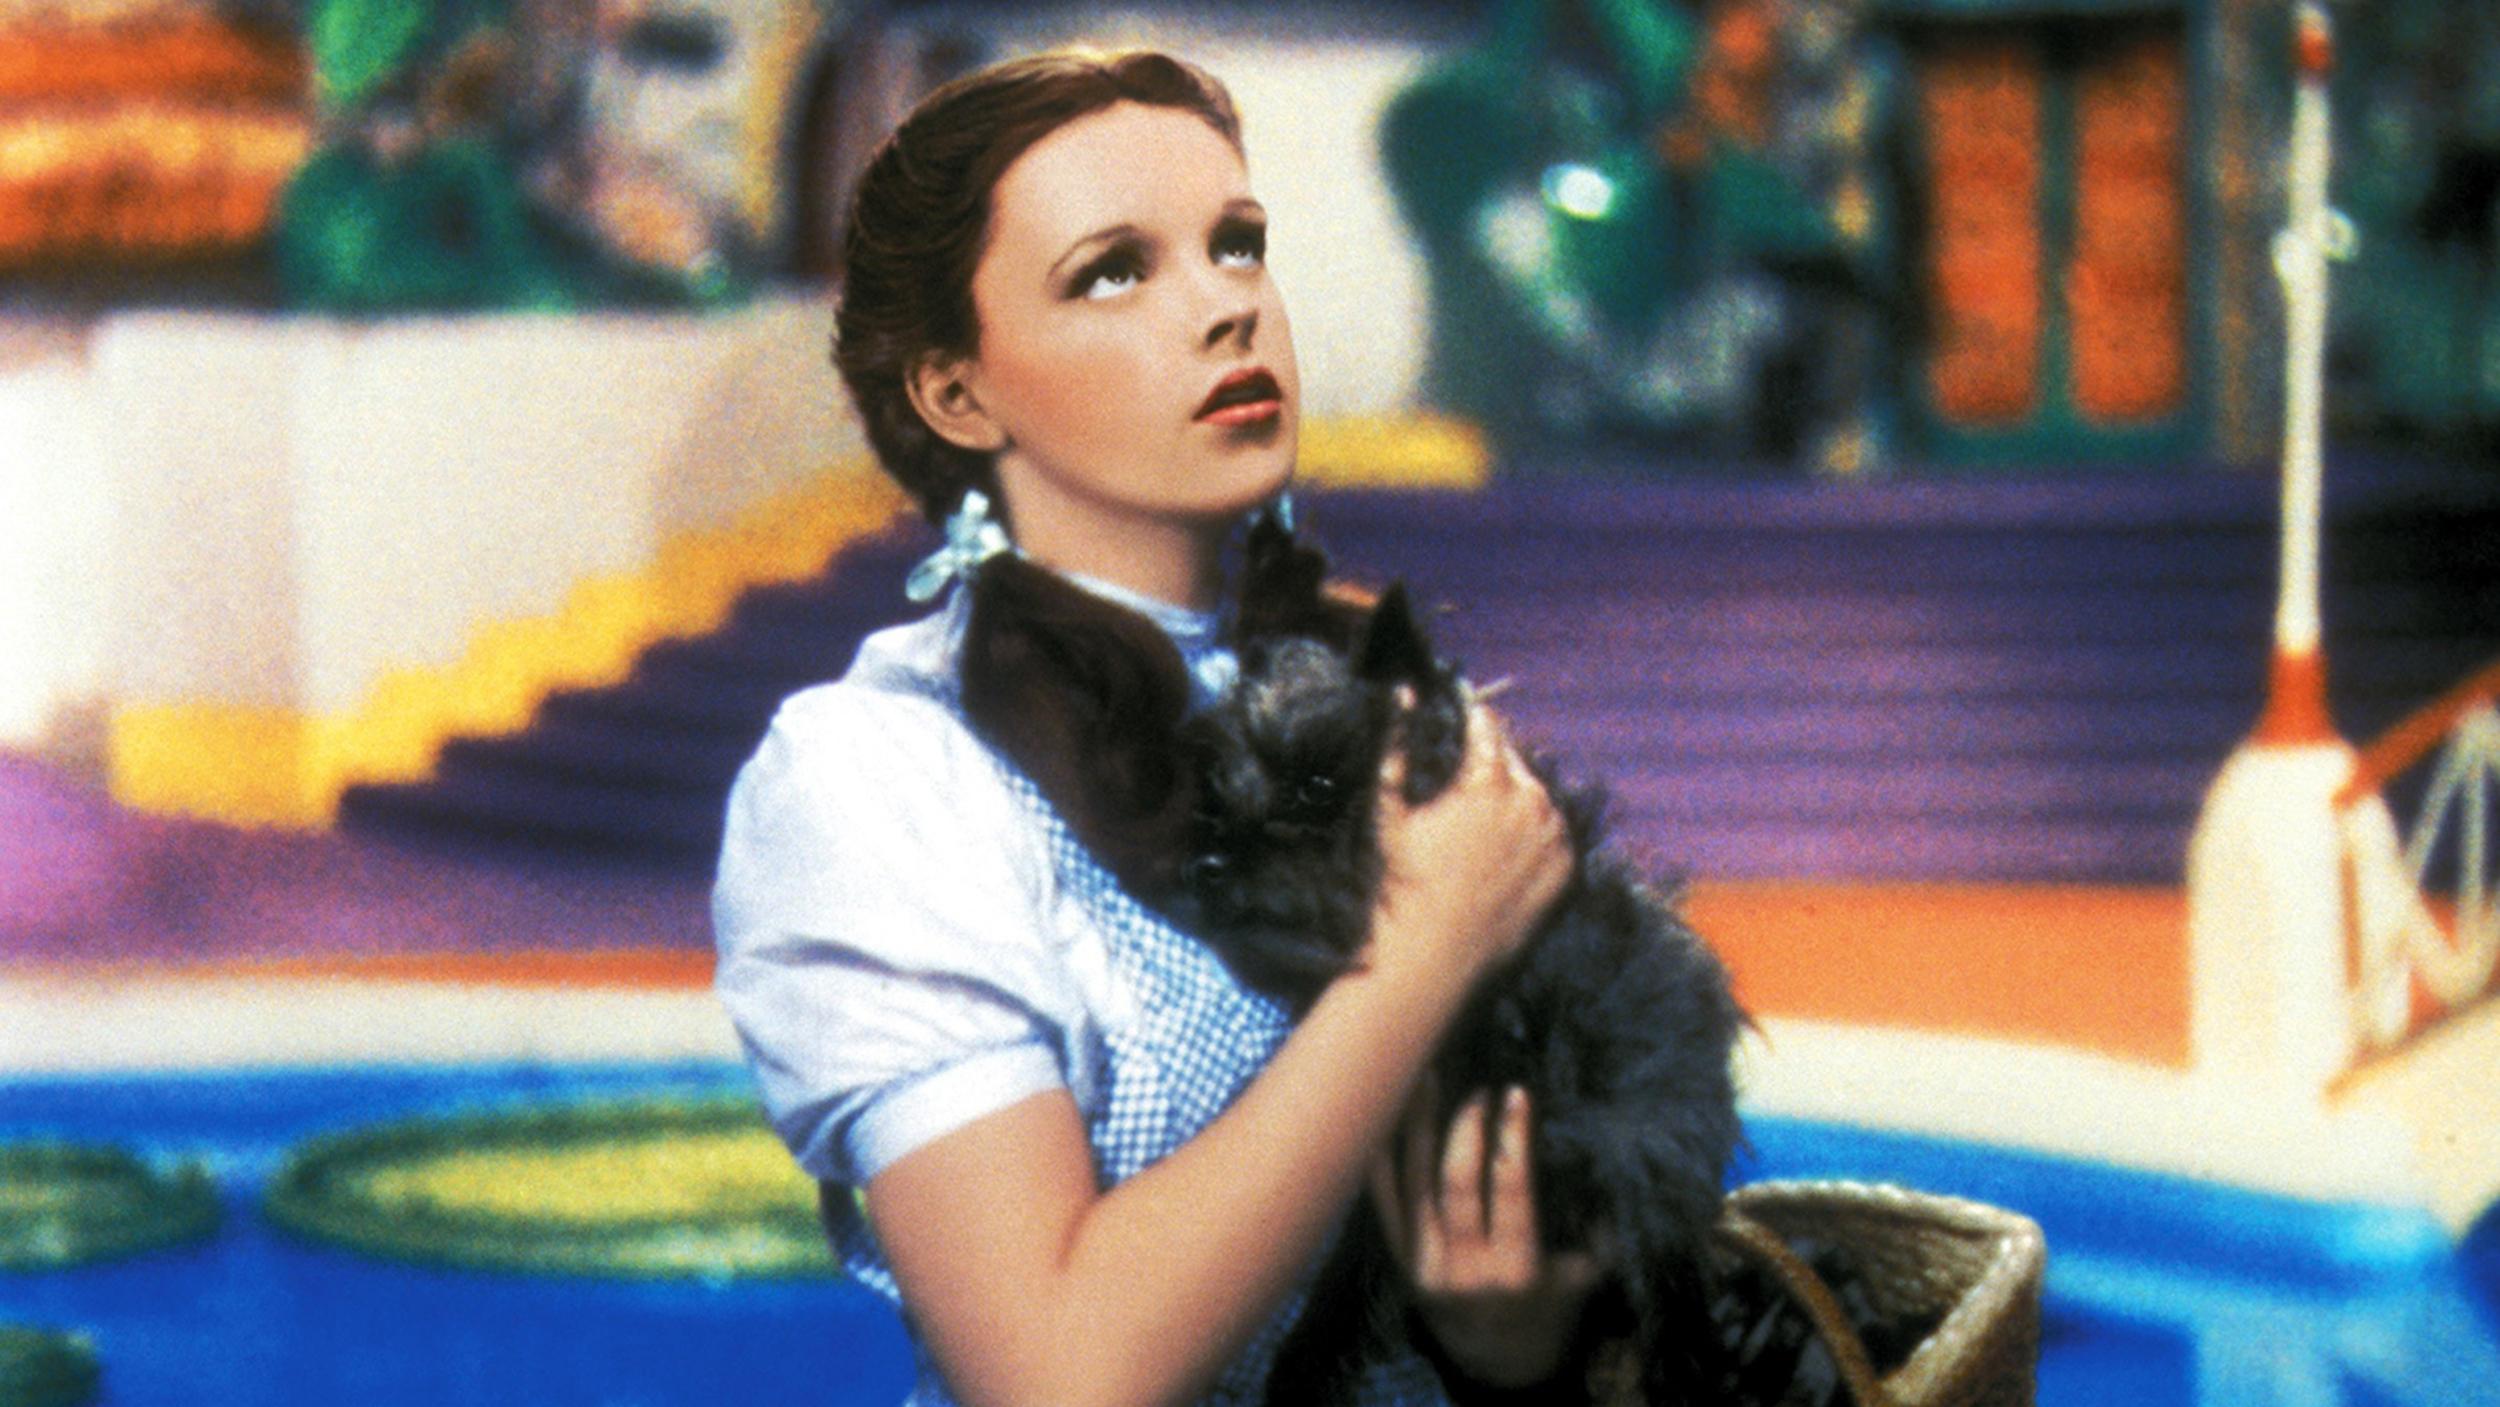 THE WIZARD OF OZ, Judy Garland